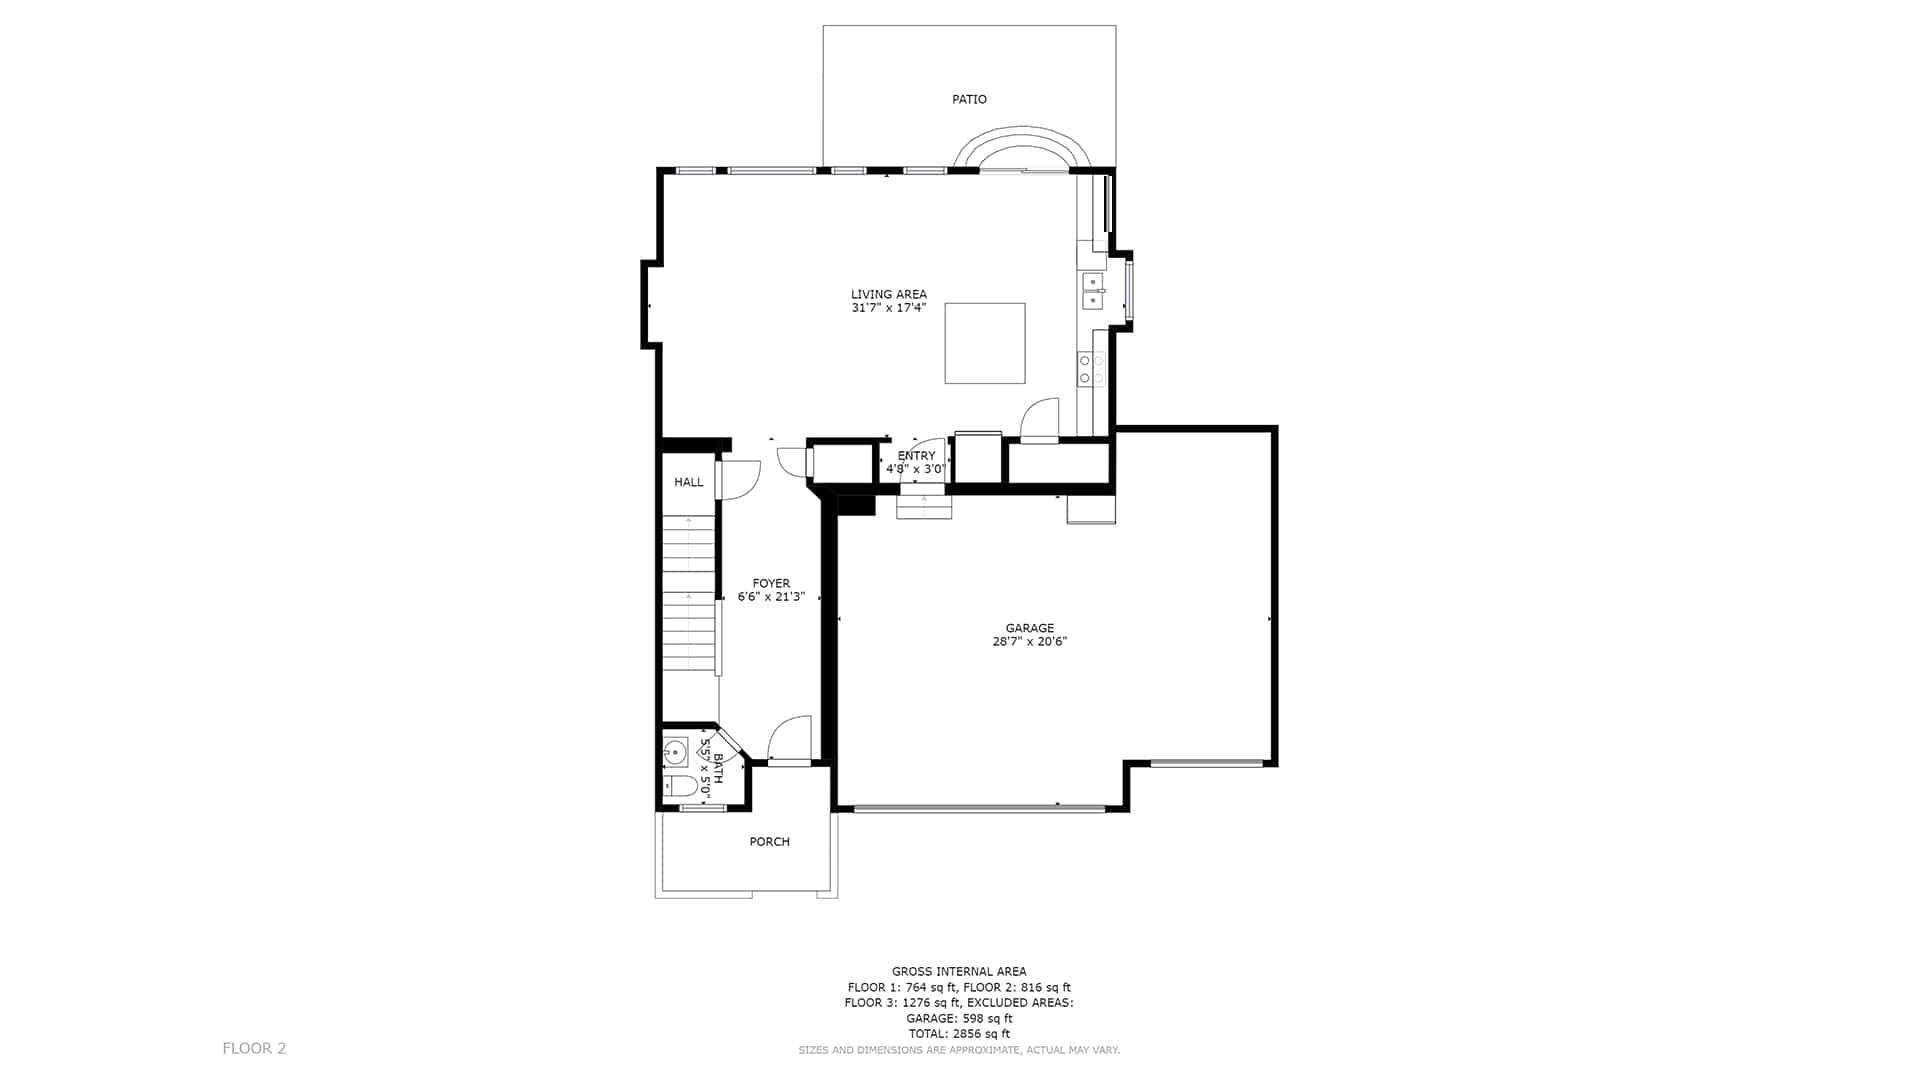 Commerce City Home For Sale Main Floor Plan